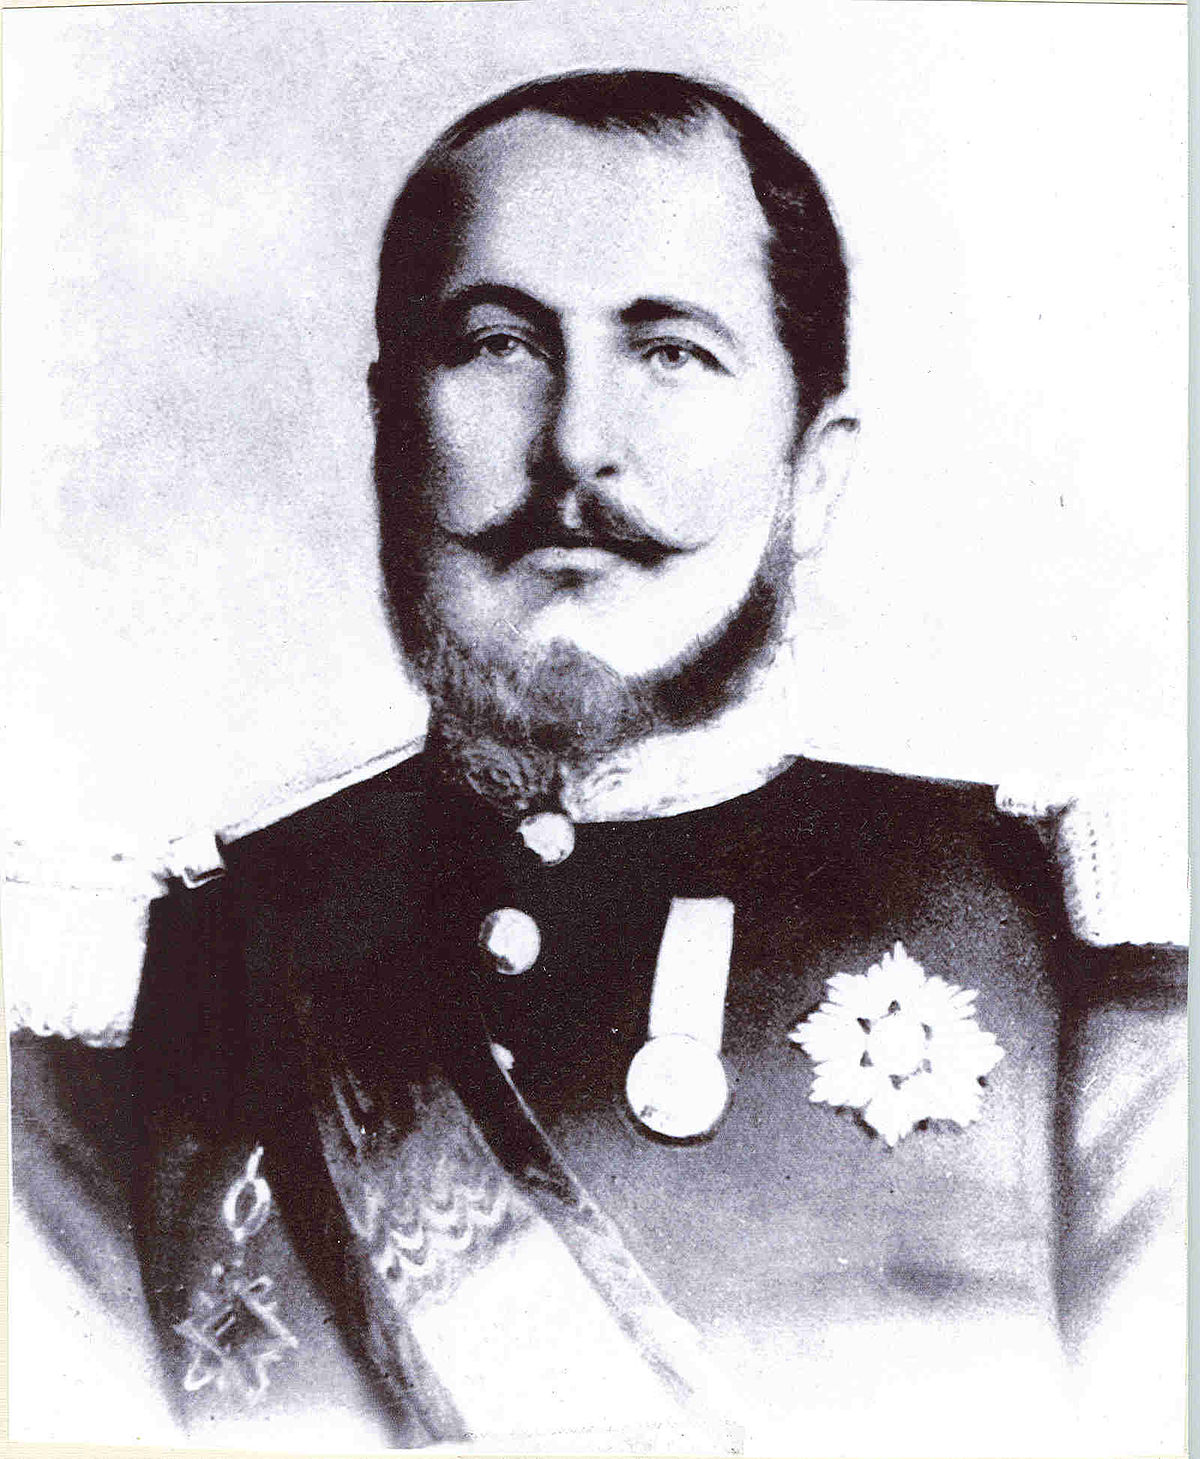 Tomás Martínez